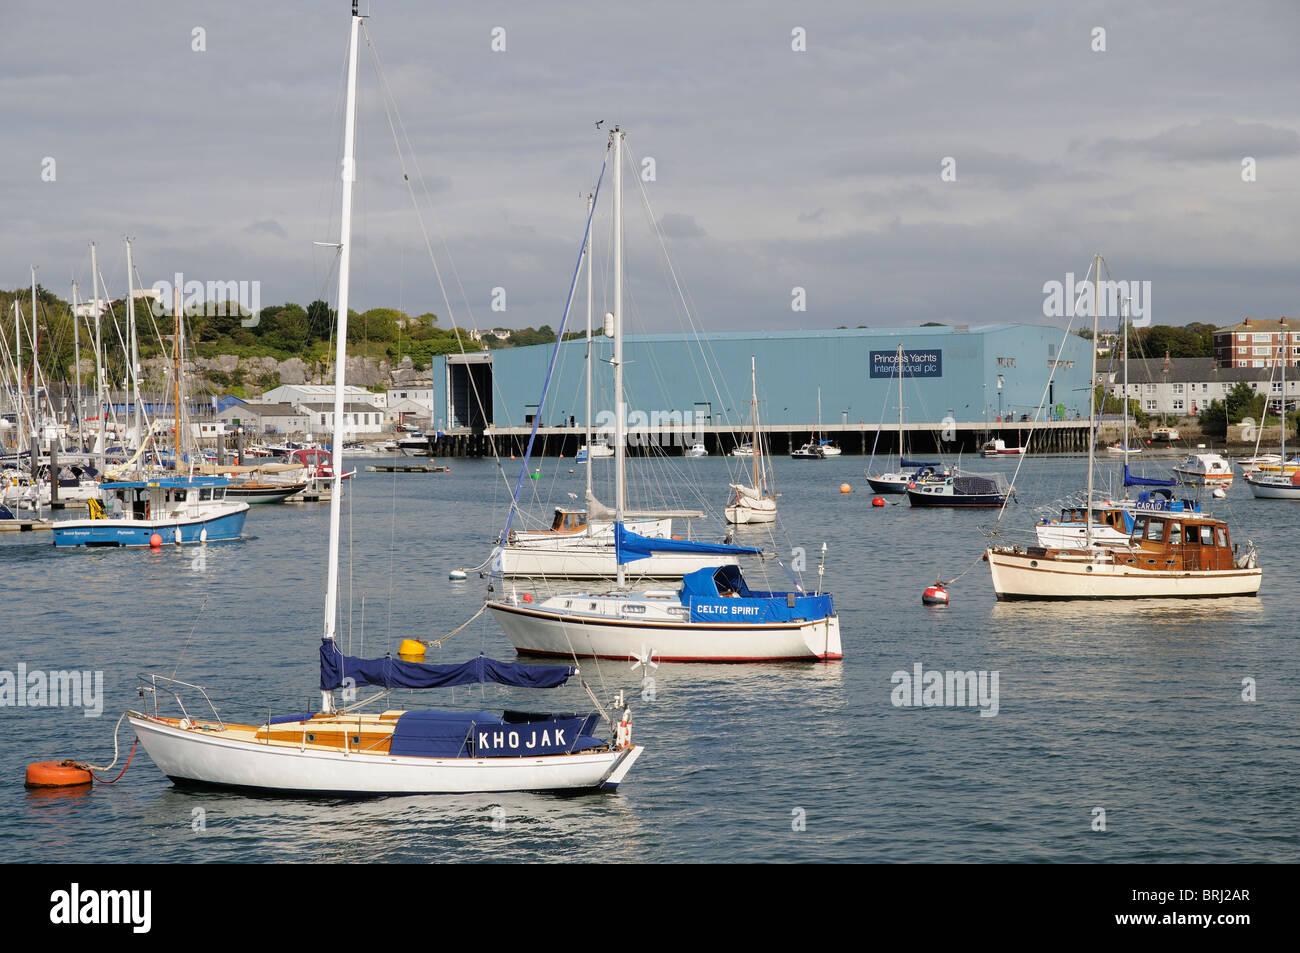 Princess Yachts International company premises on River Tamar South Devon  England UK 383edf214